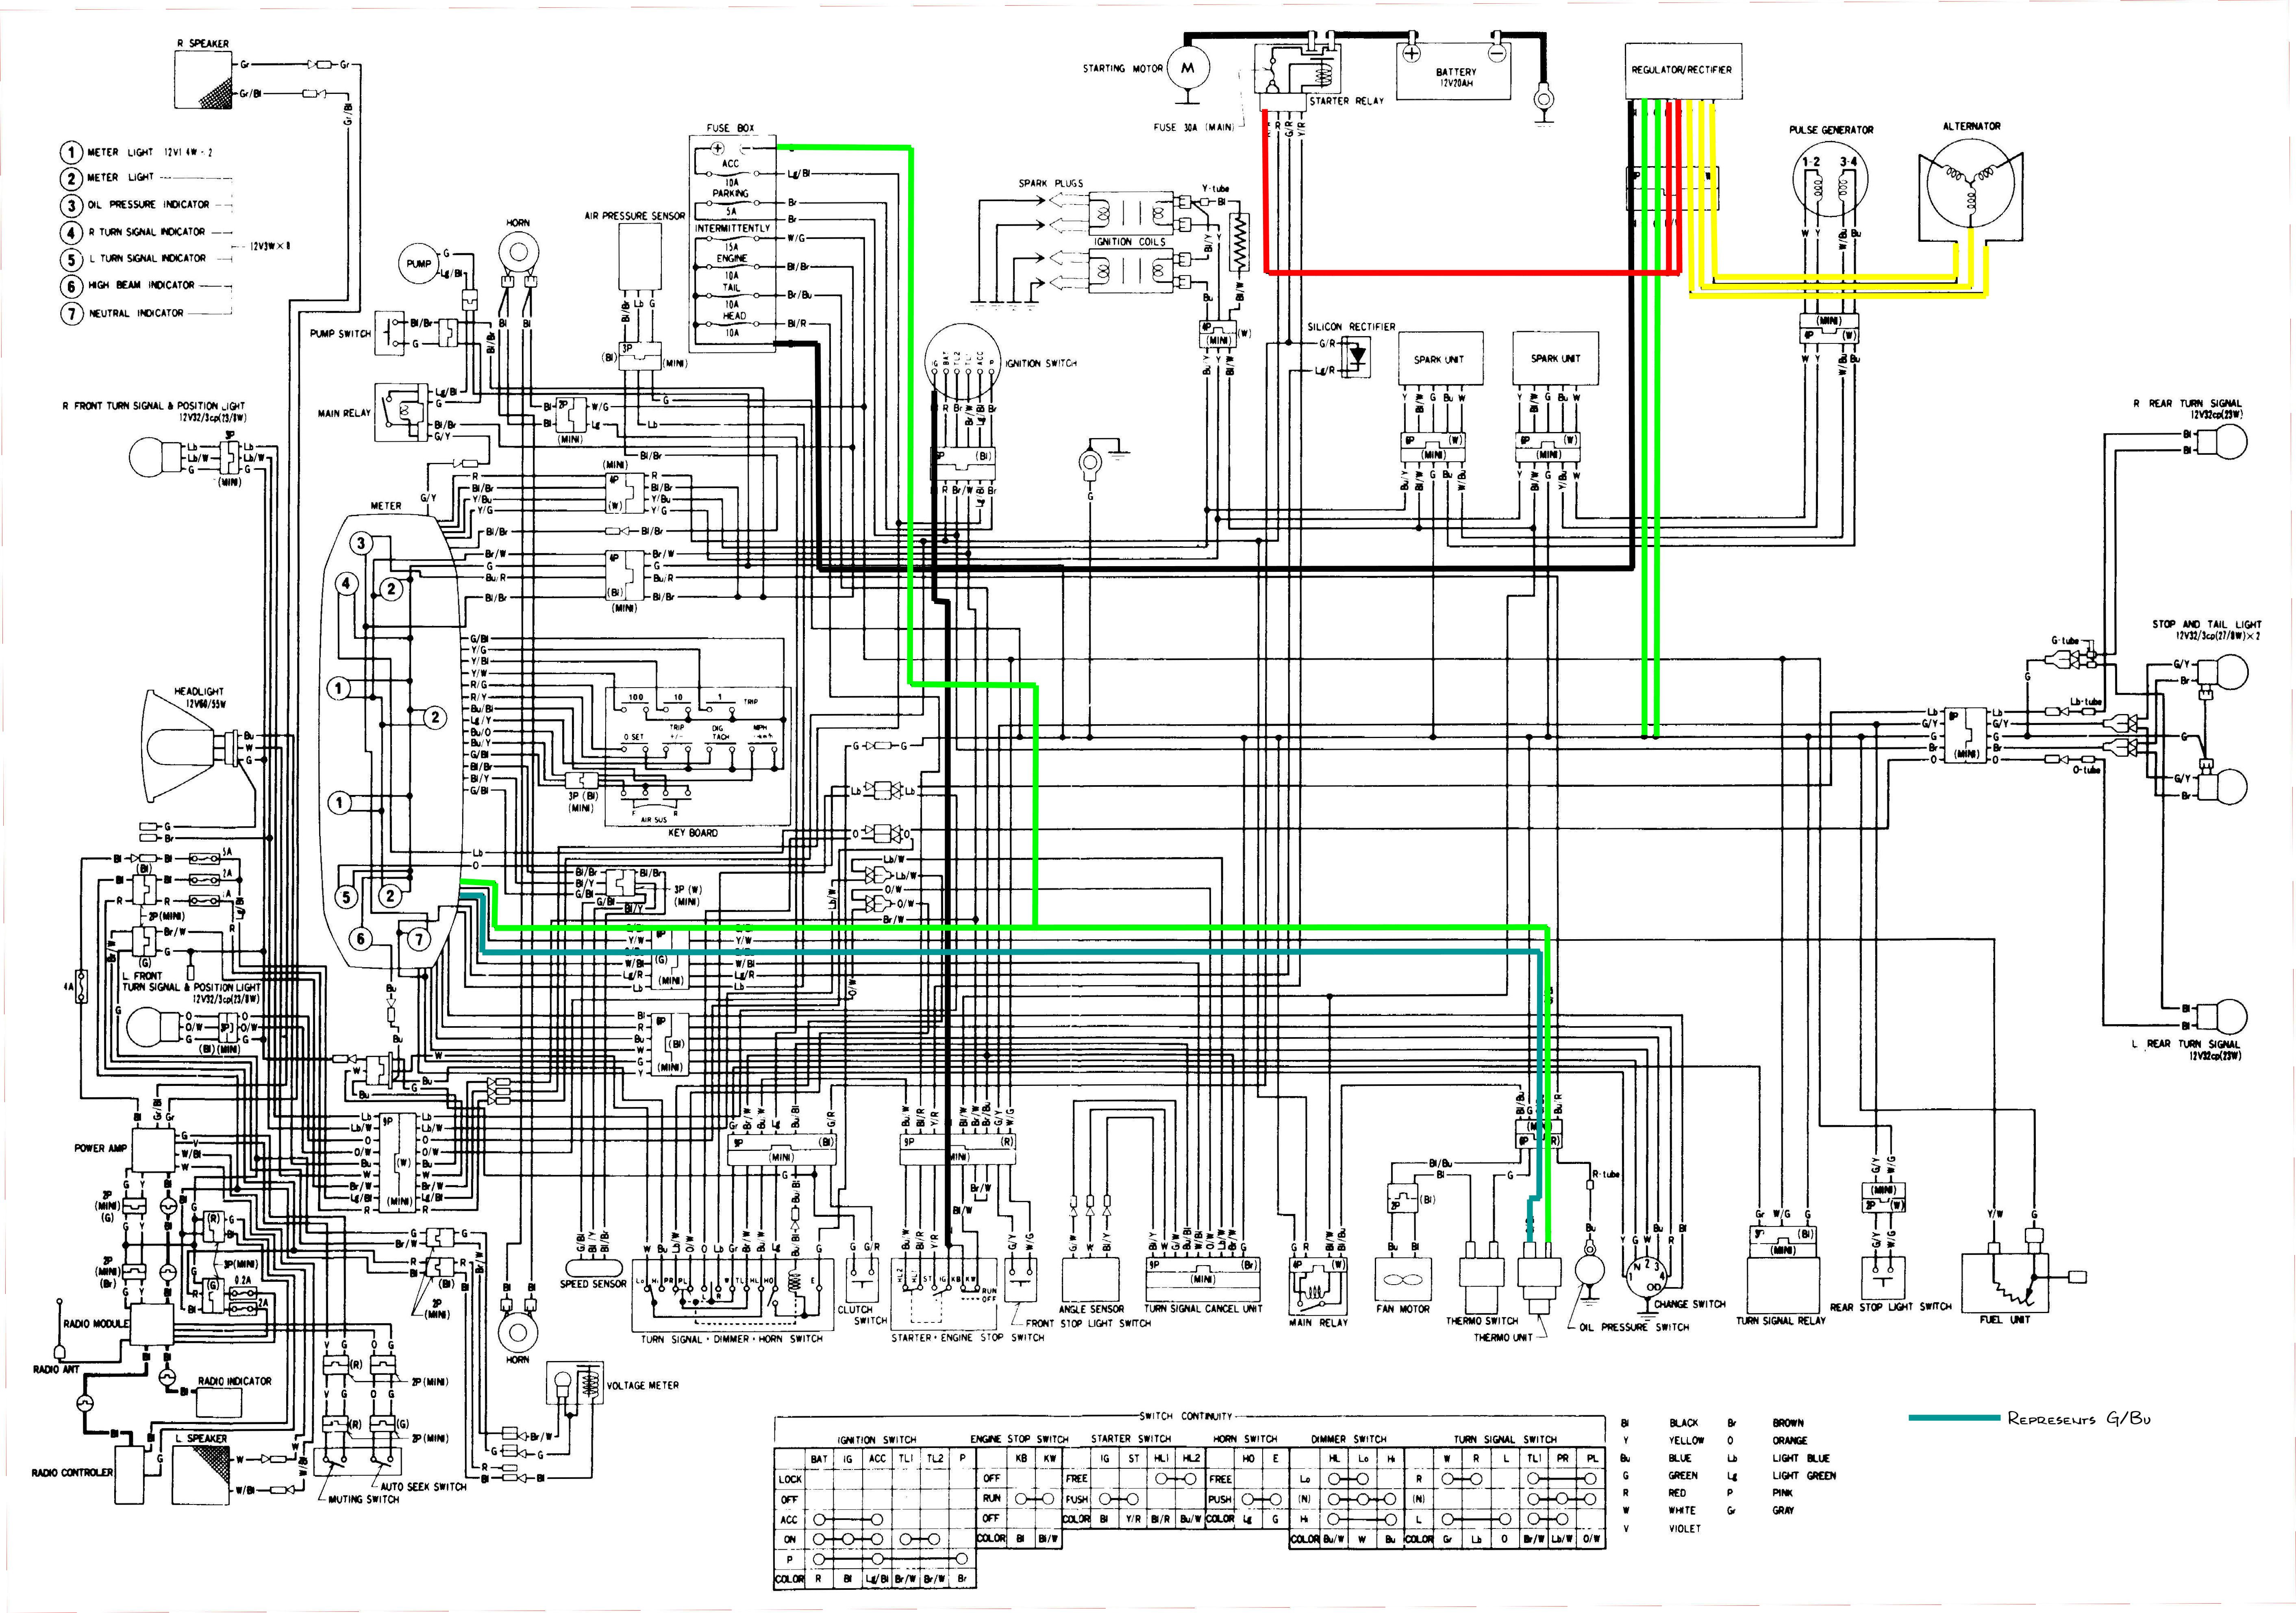 1982 Honda Goldwing Voltmeter Wiring Diagram